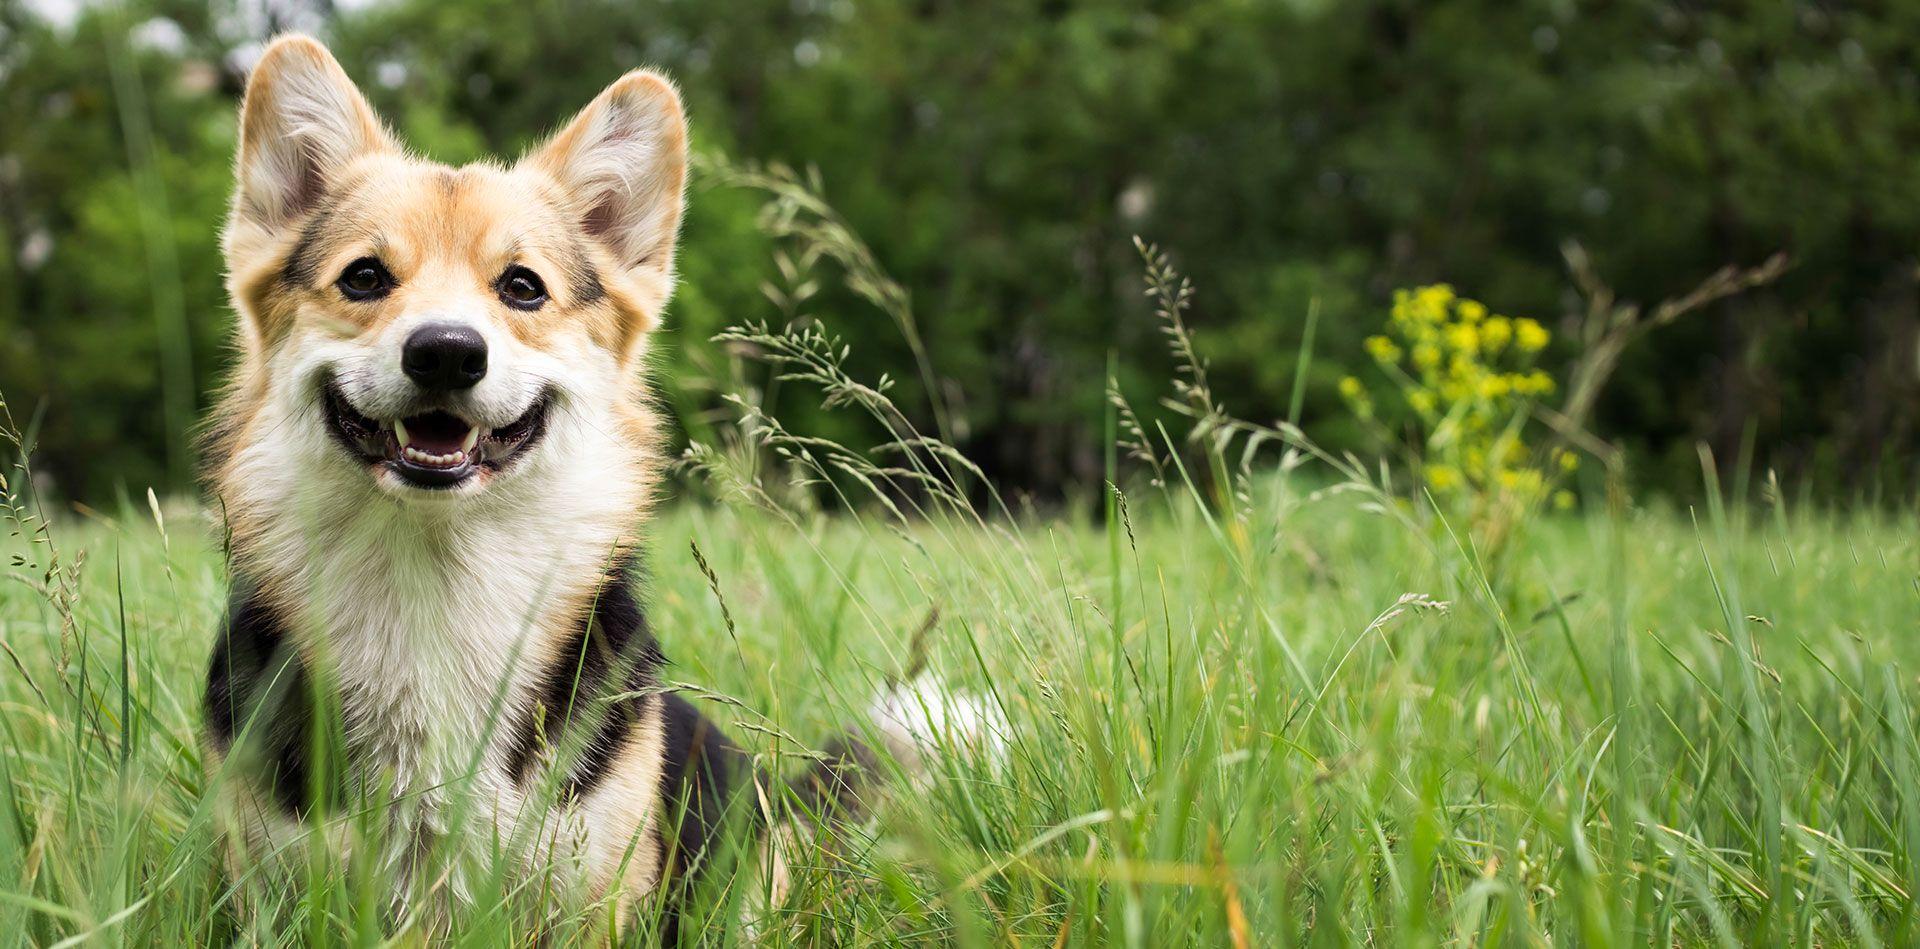 dog in a green field